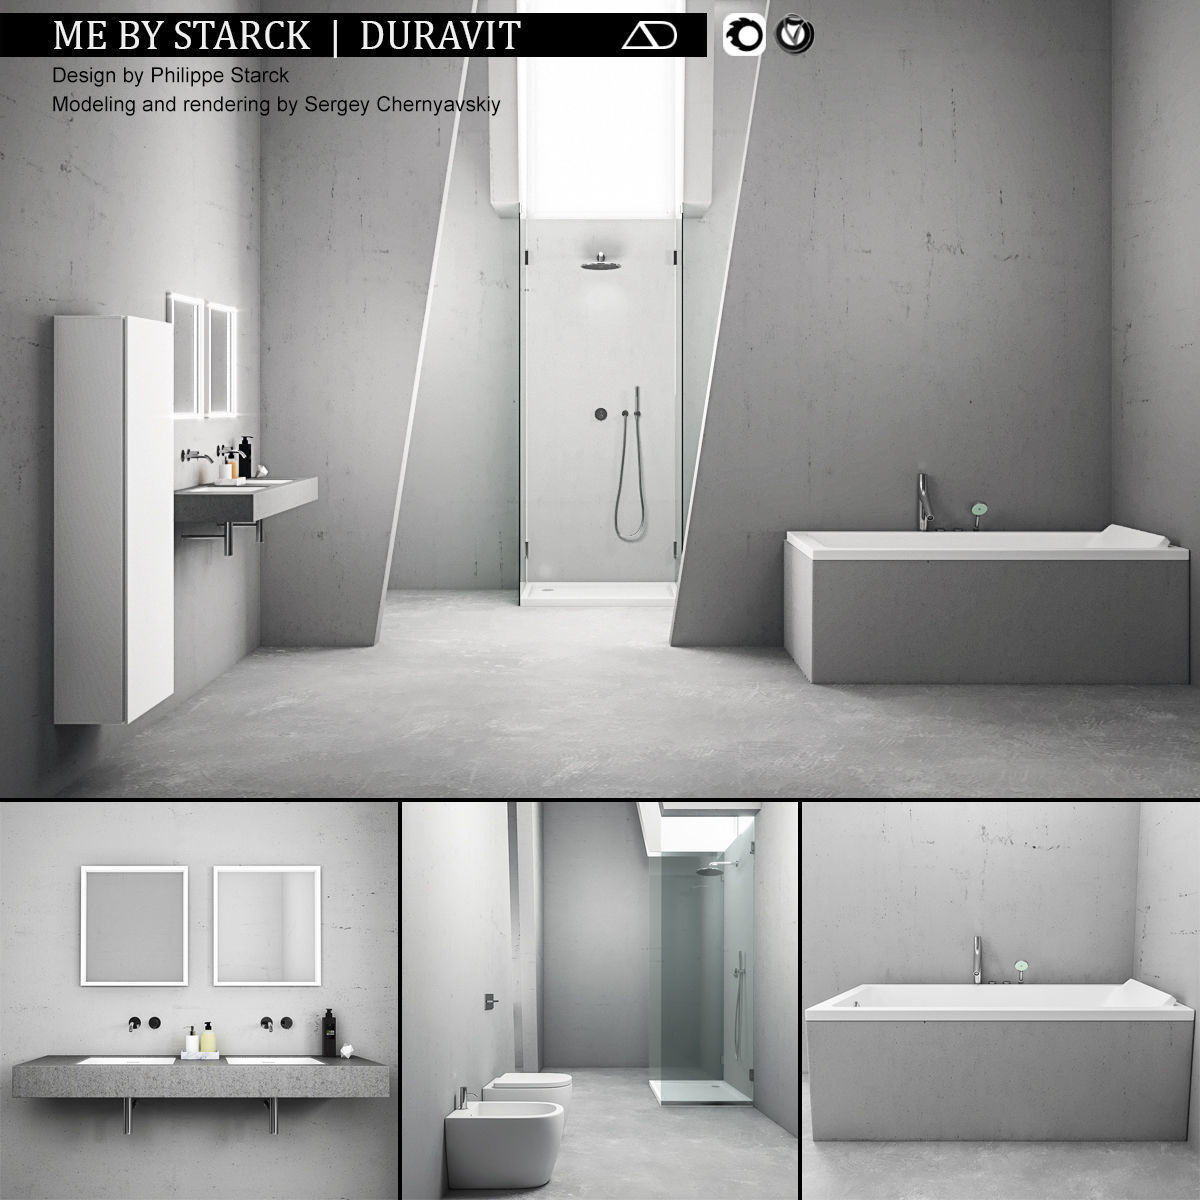 3D Bathroom furniture set ME by Starck Duravit | CGTrader